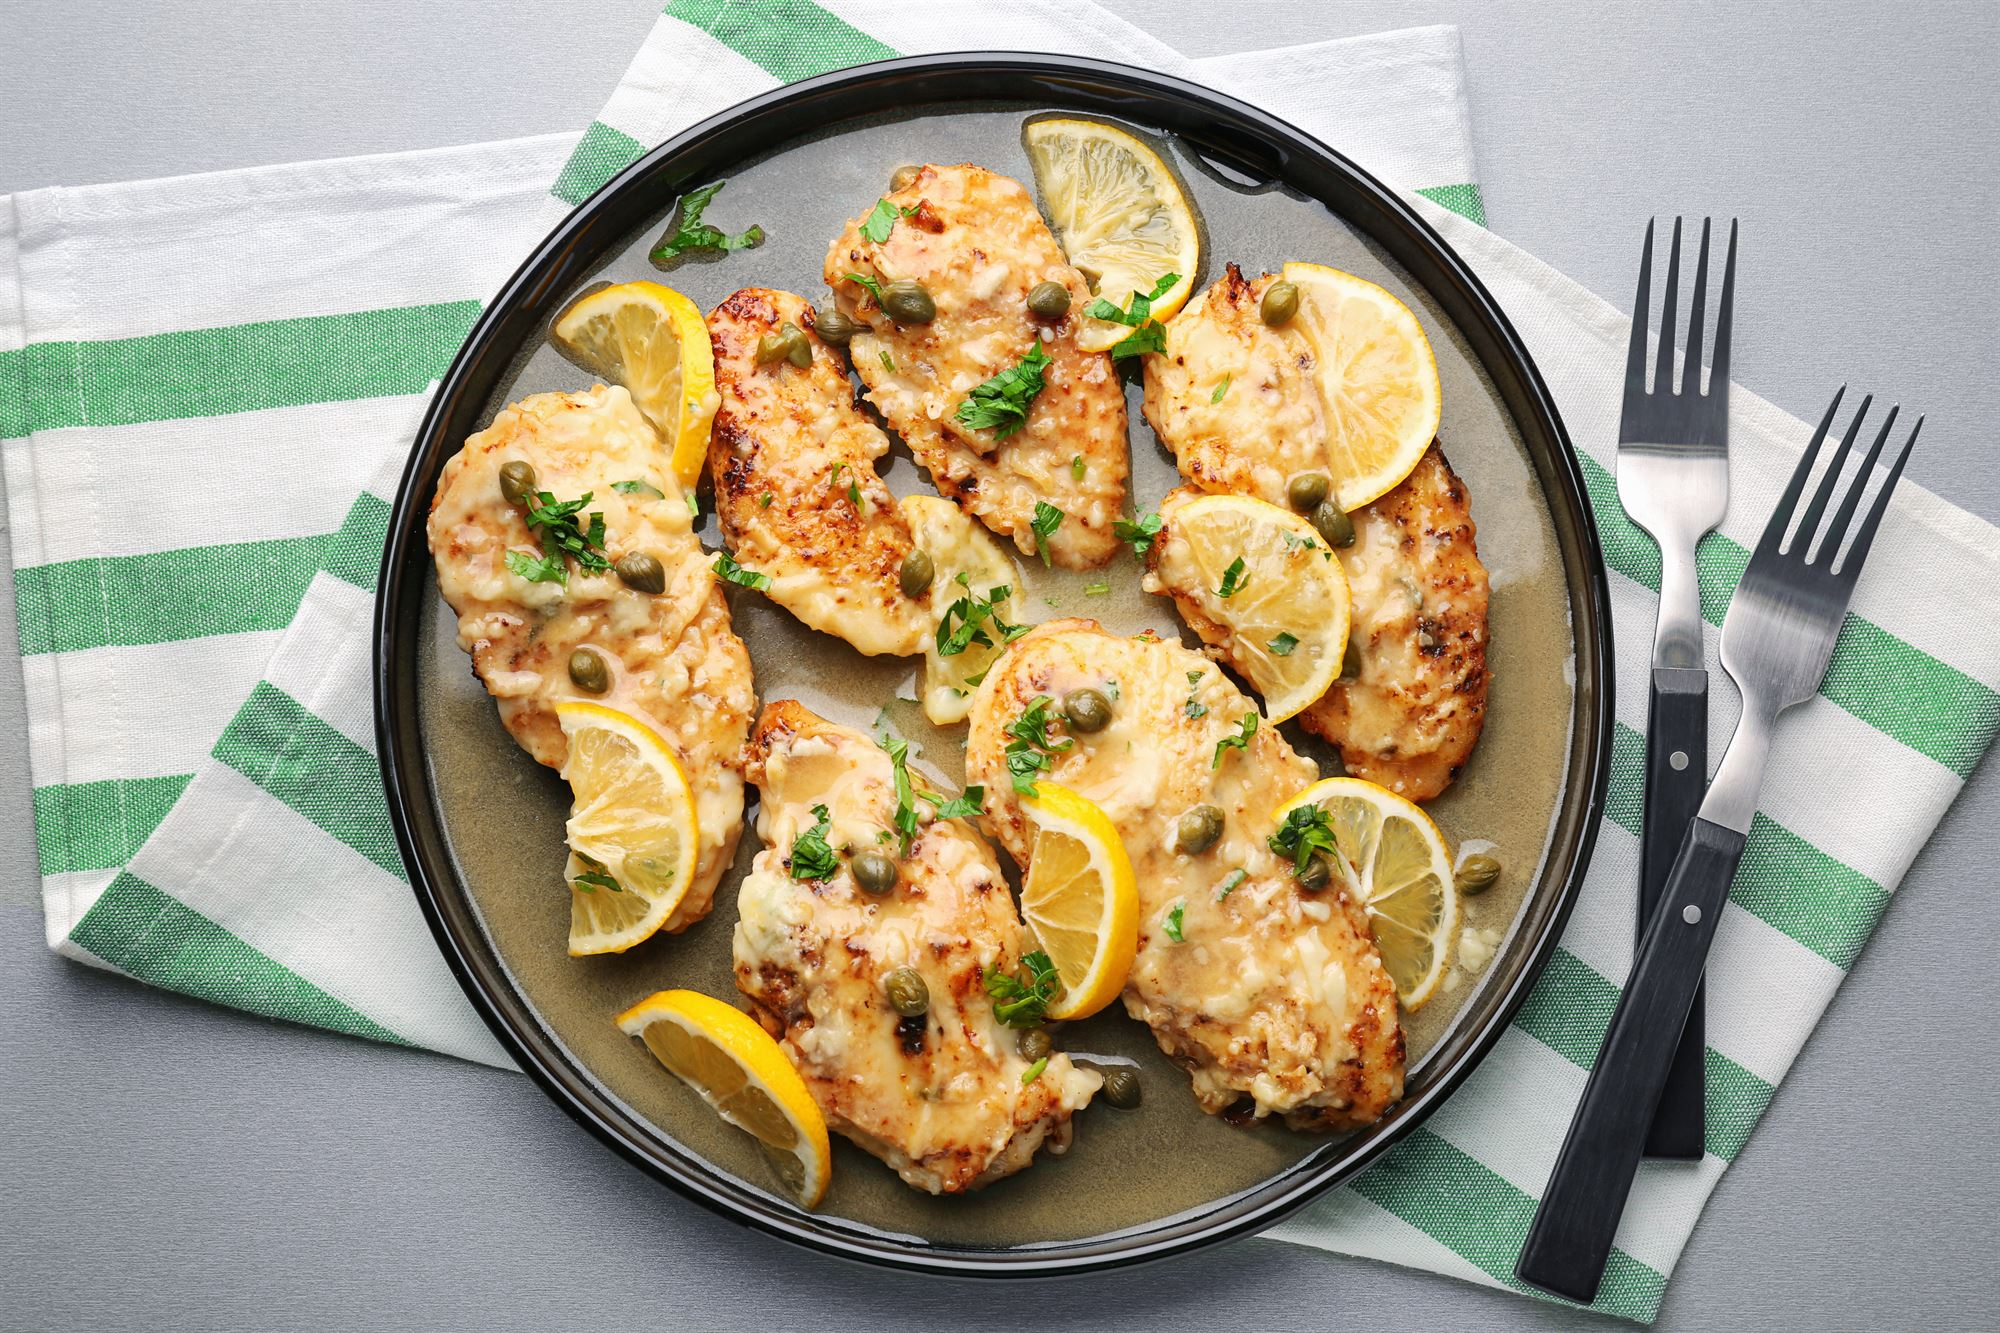 Kylling med citron- og kaperssauce